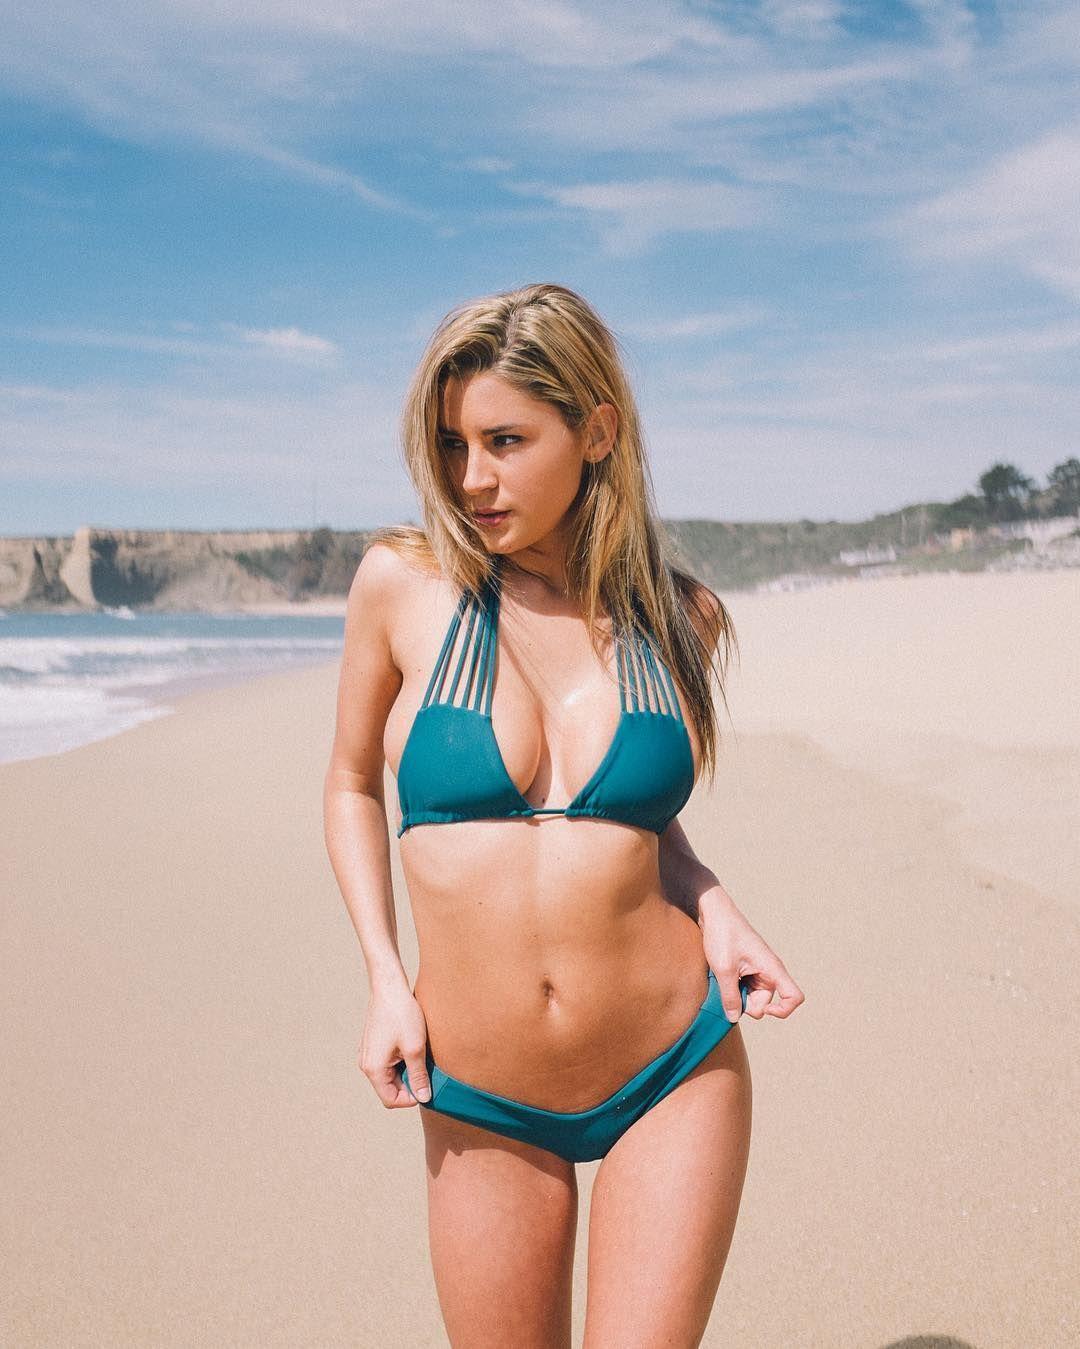 Beachwear Classic Pantyhose Economic